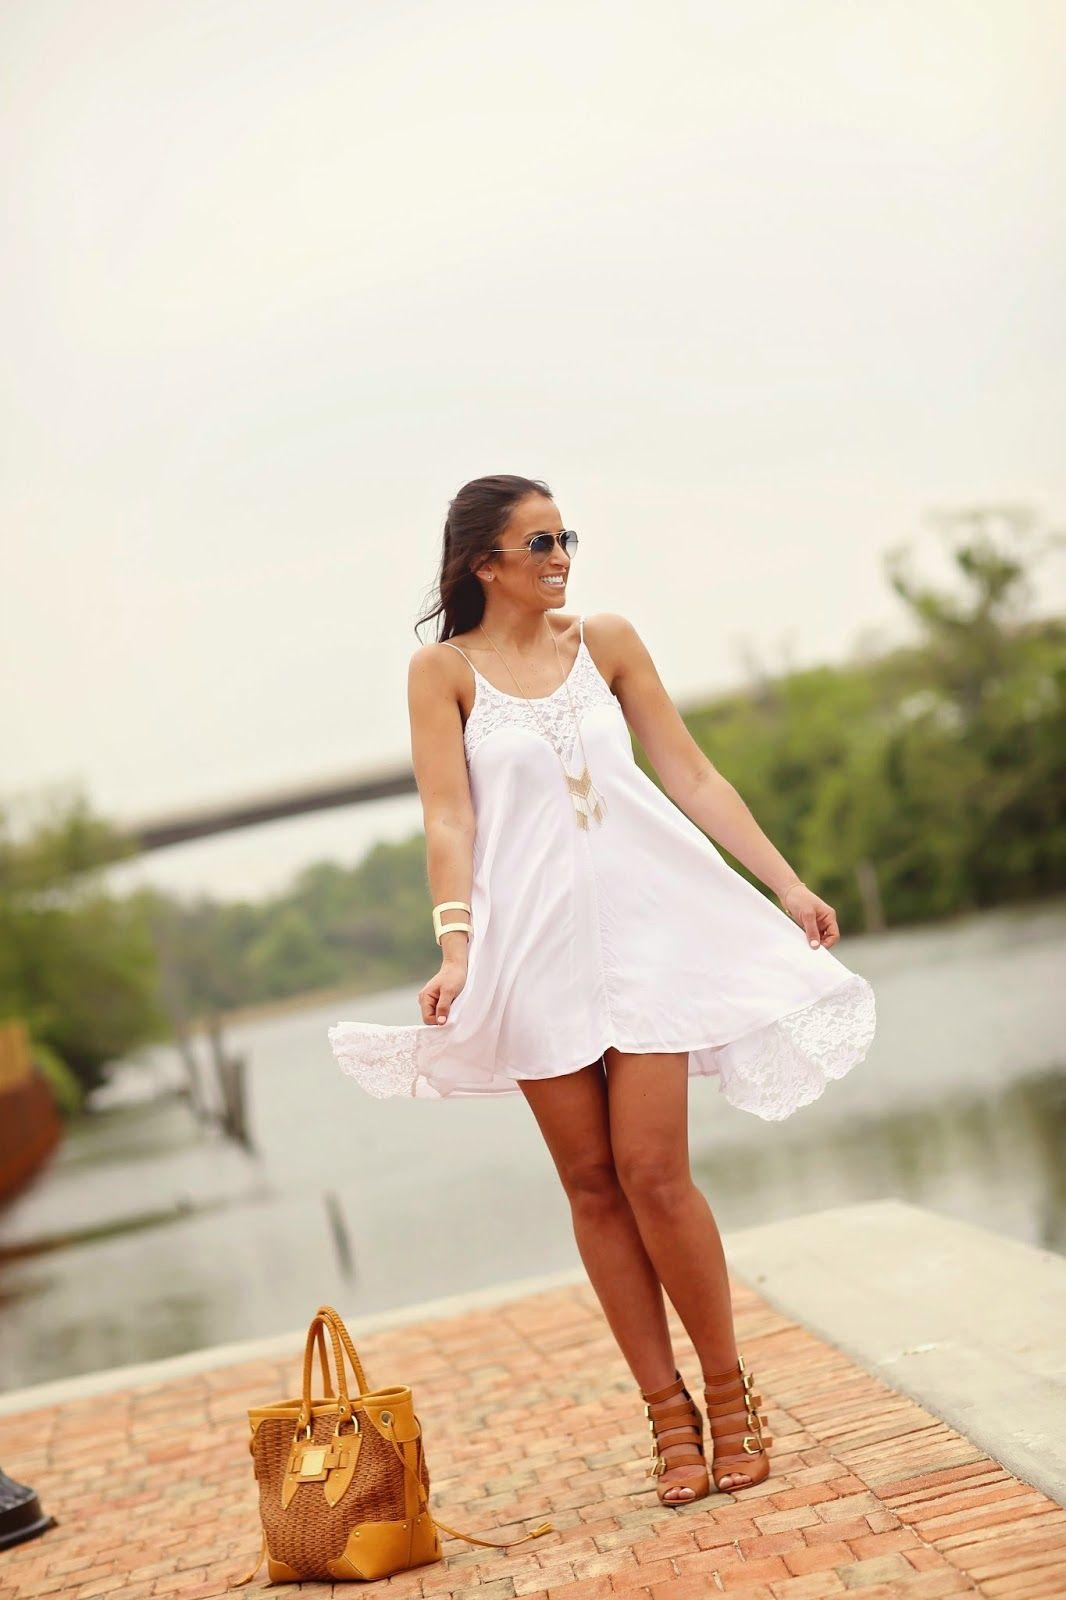 8284d0e616d Forever 21 strappy sandal bootie // car shoe bag // Charlotte Russe white  flowing summer dress